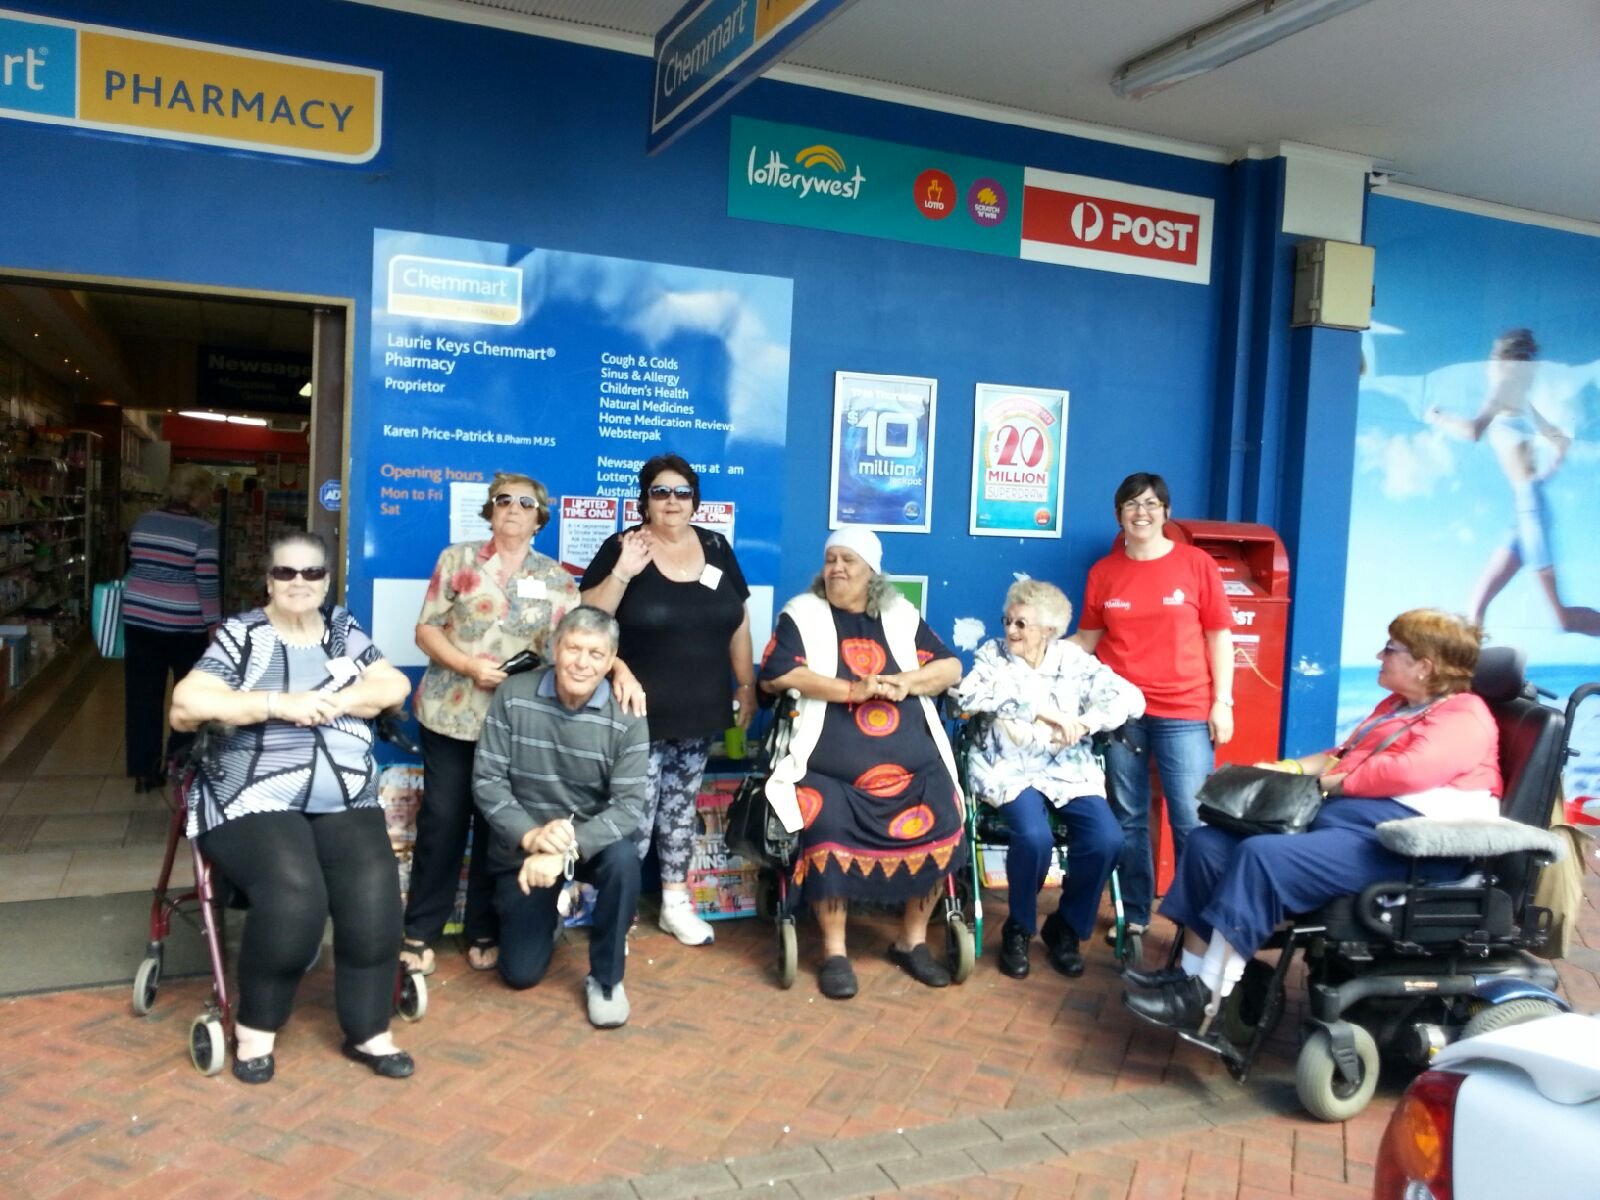 Walking group members posing outside the pharmacy